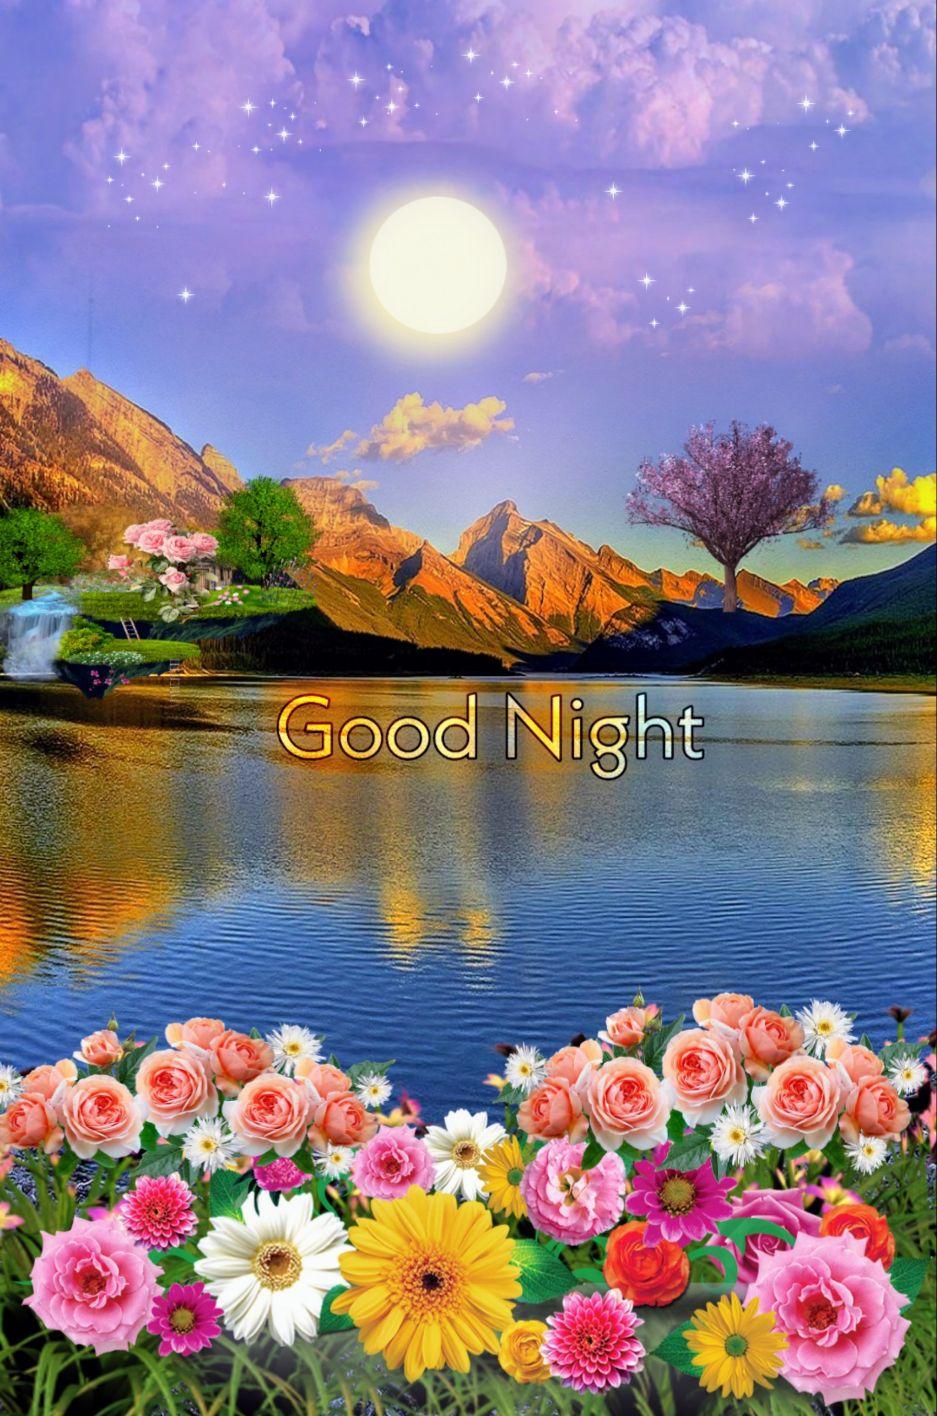 good night - - Good Night - ShareChat